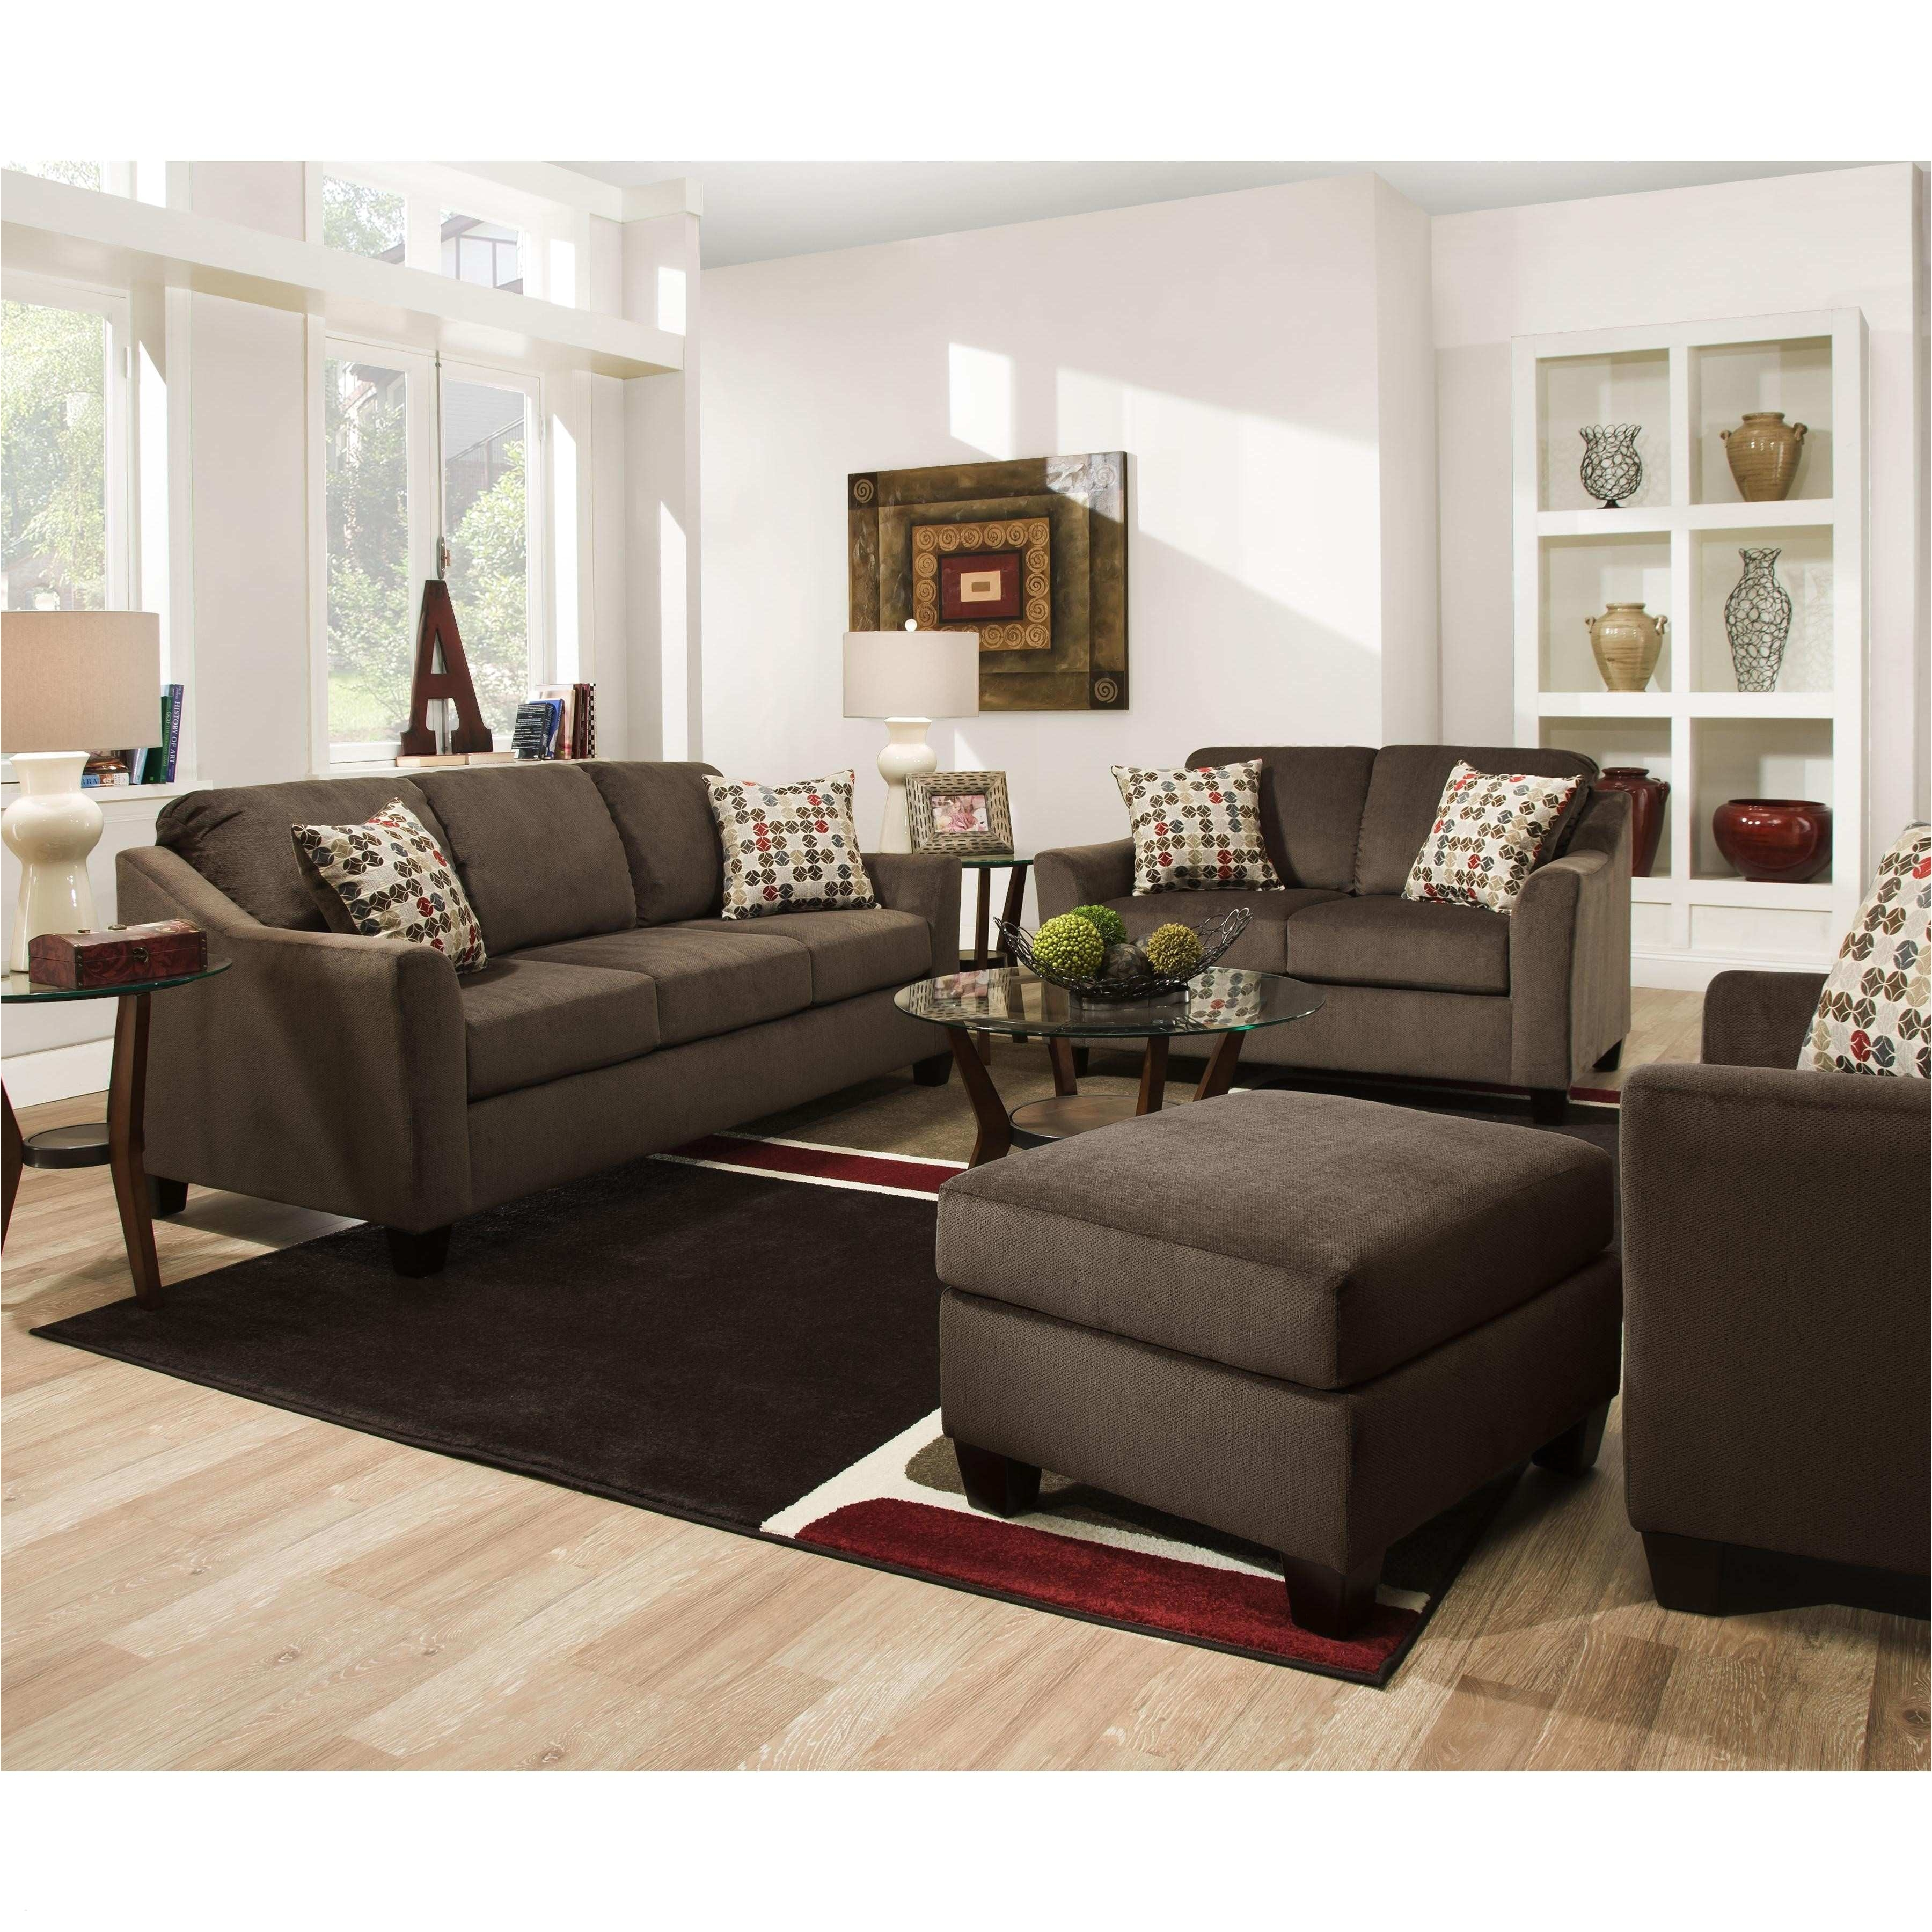 comfortable family room furniture of gorgeous living room sofa ideas designsolutions usa com